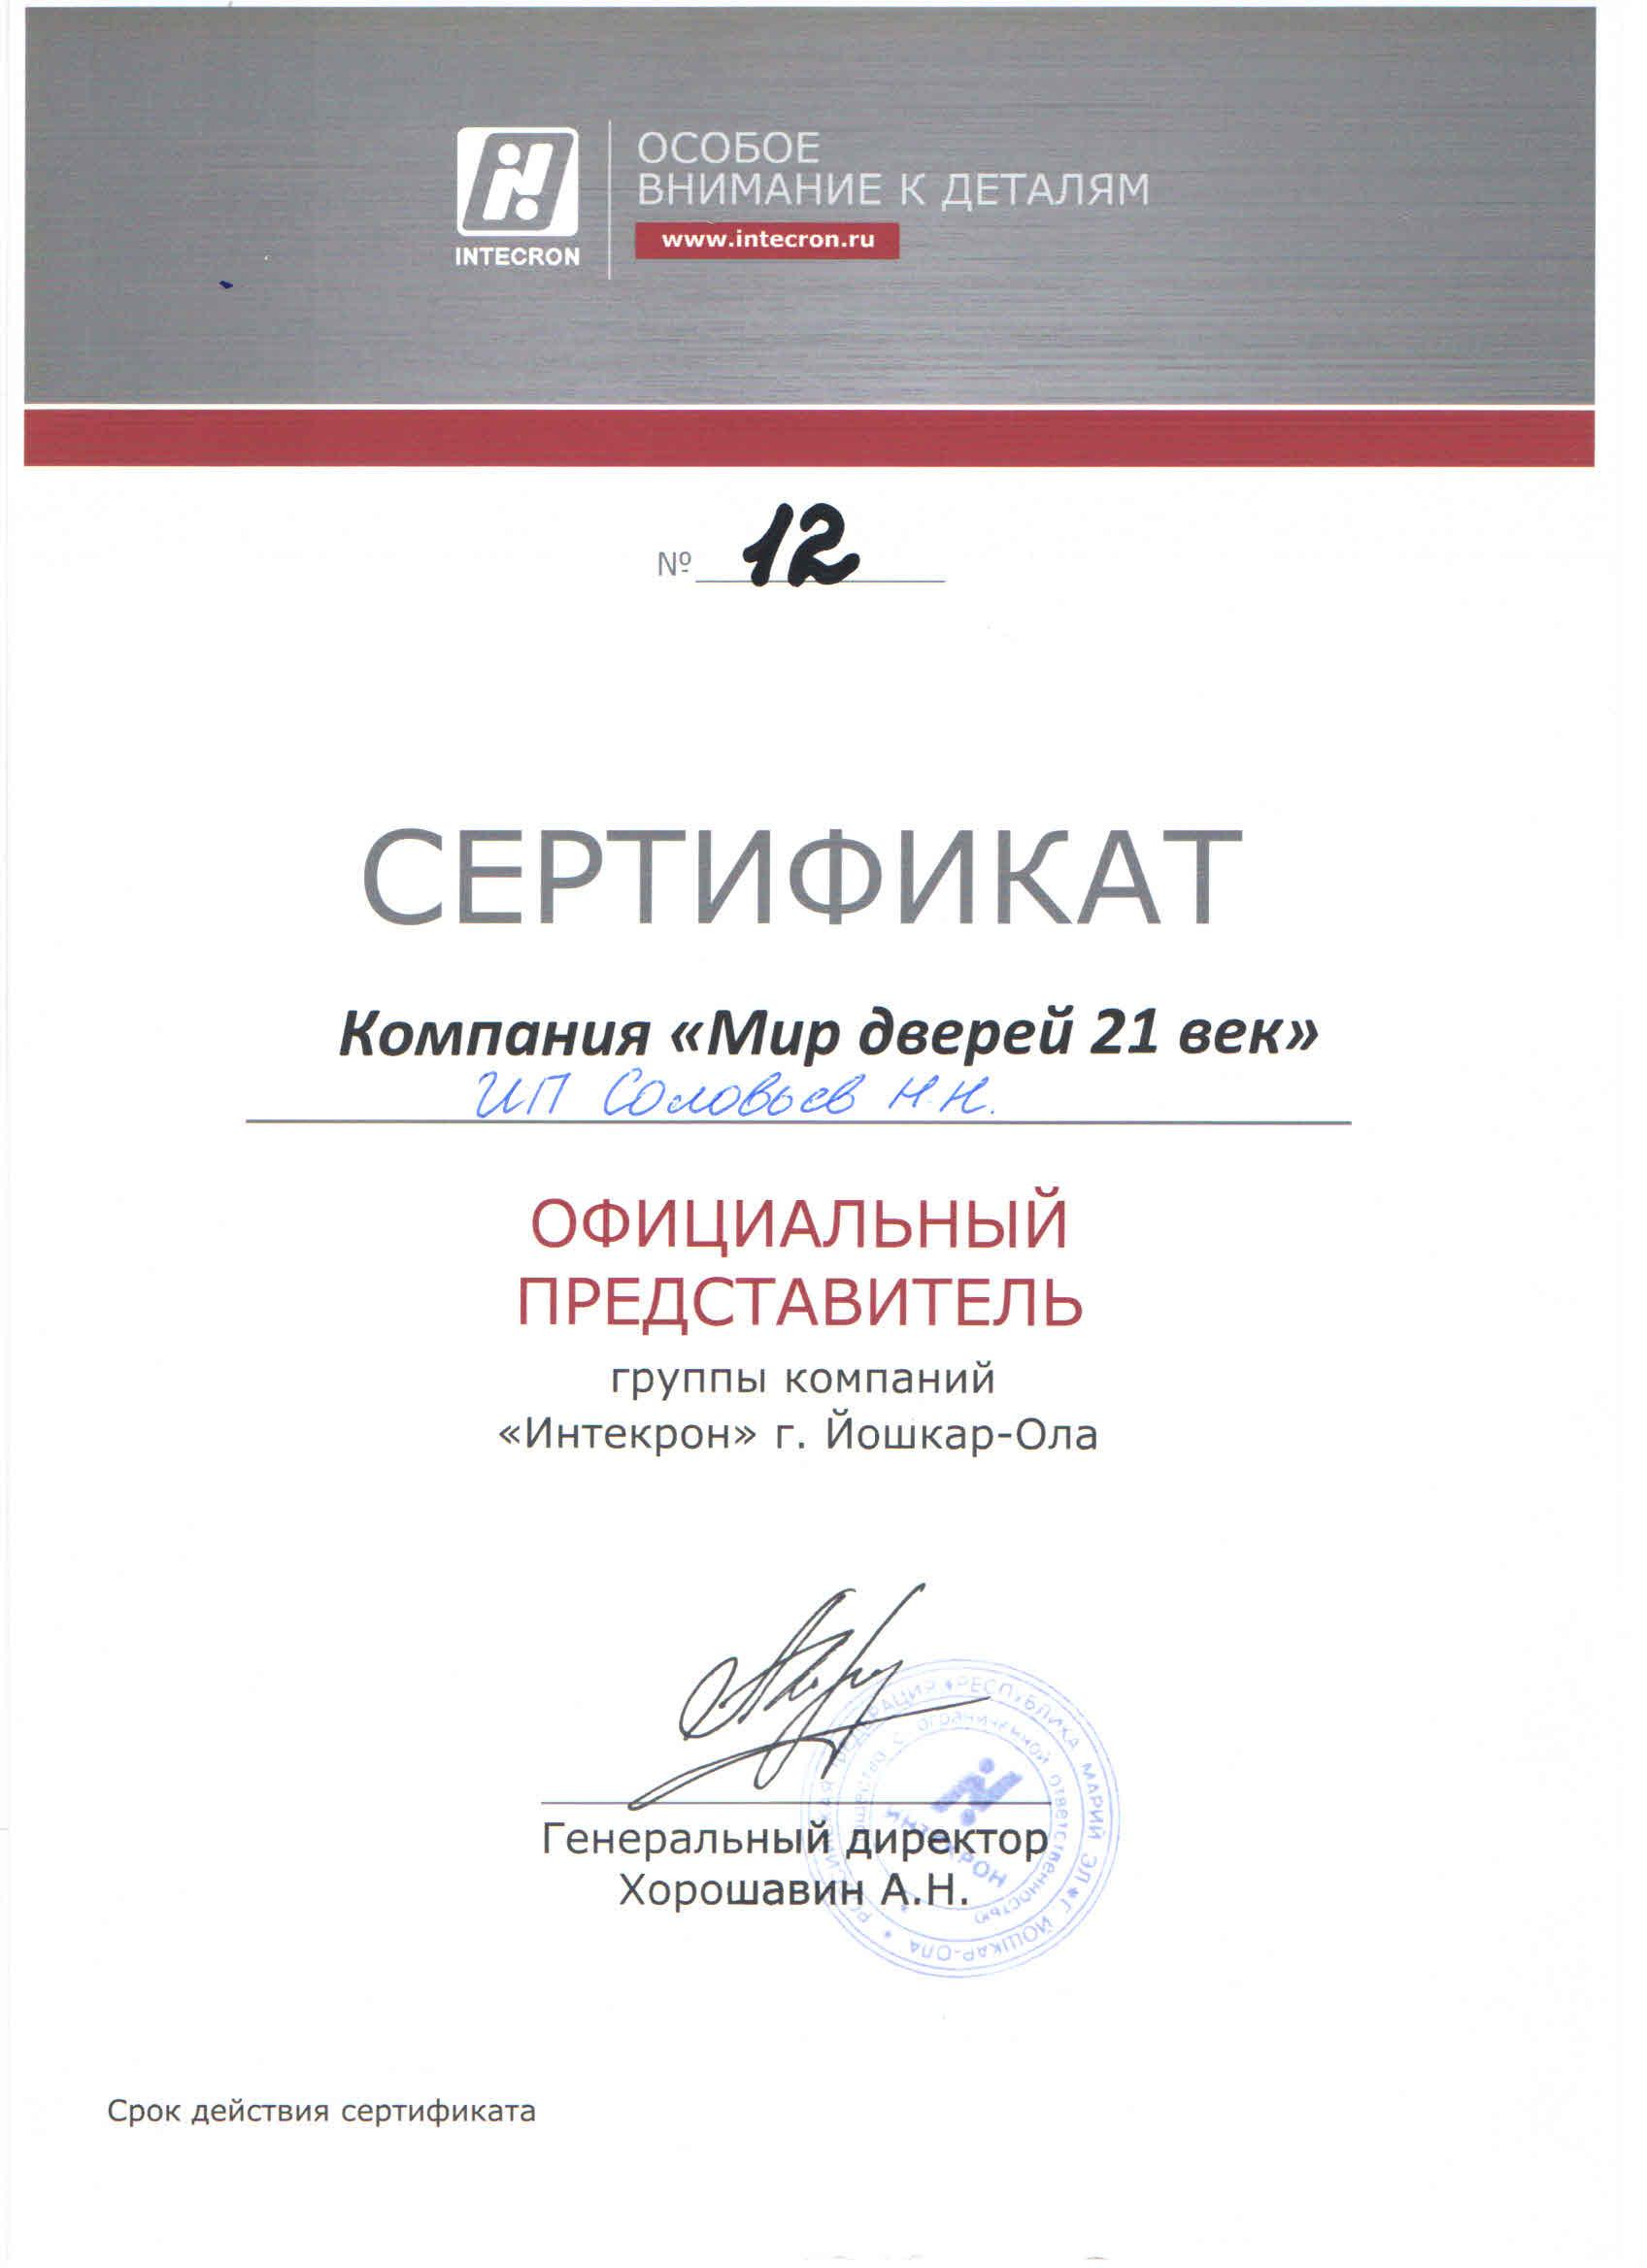 сертификат дилера Интекрон